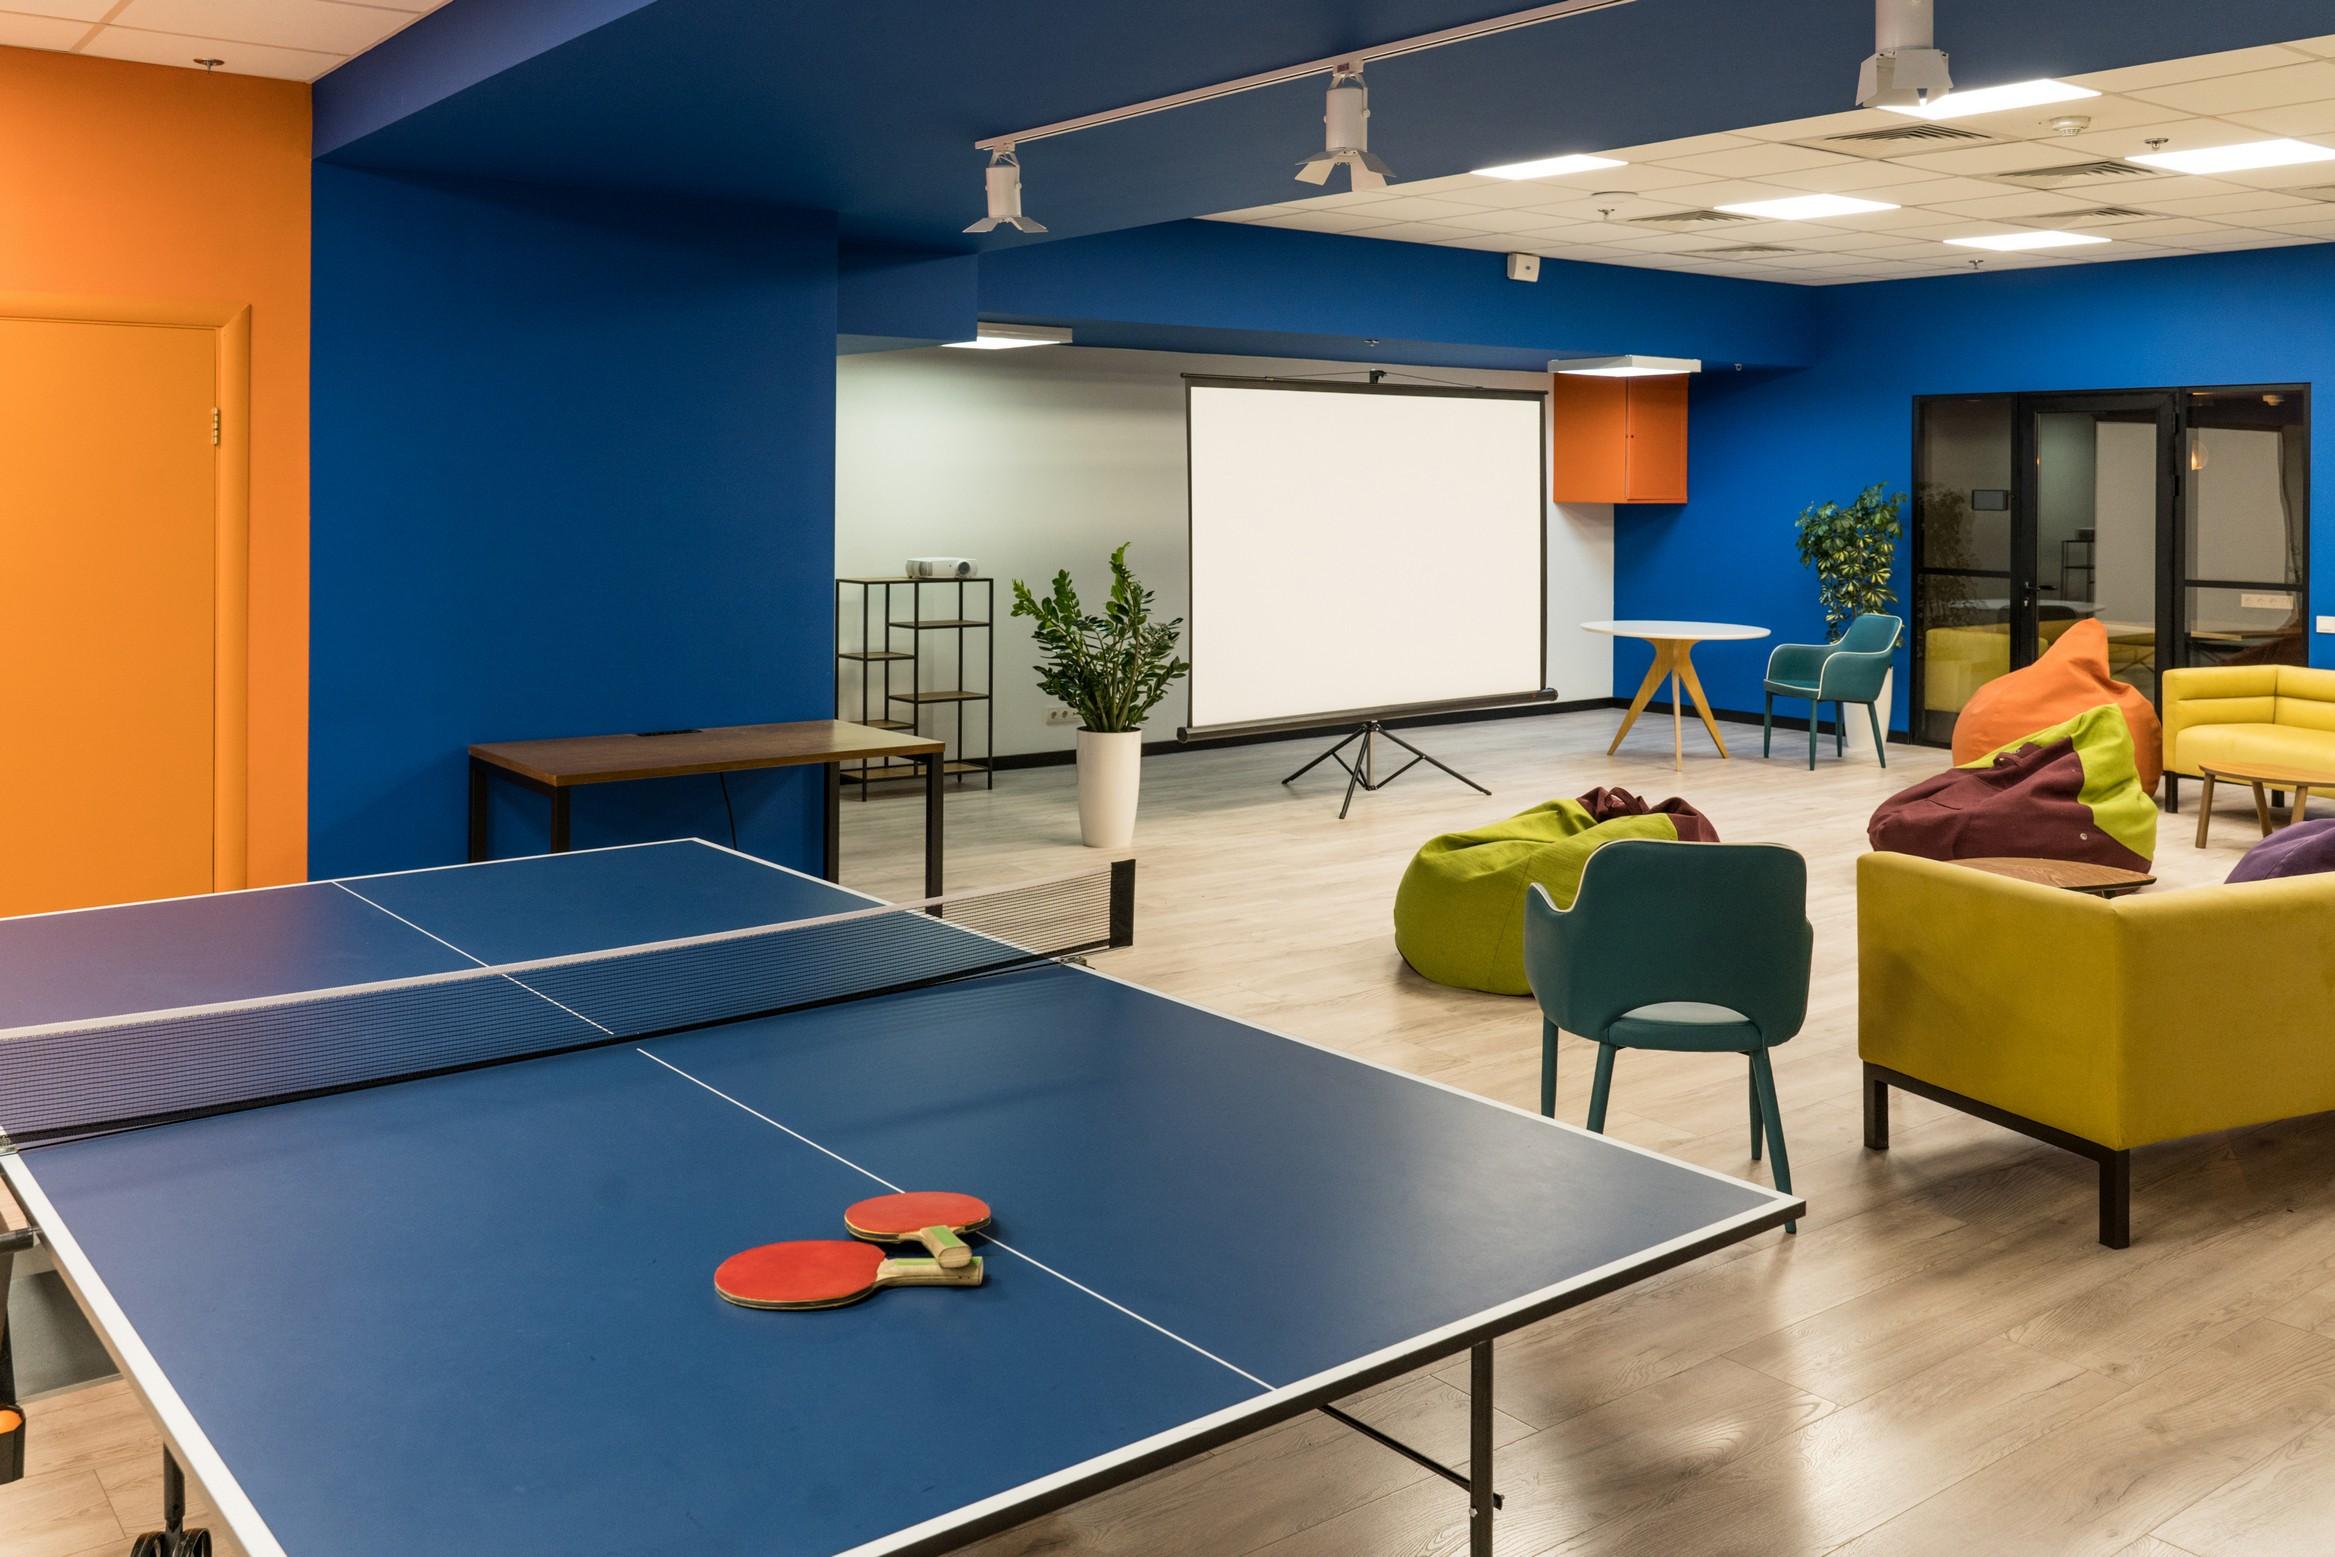 Subsidized Break Room Benefits in San Francisco Bay Area